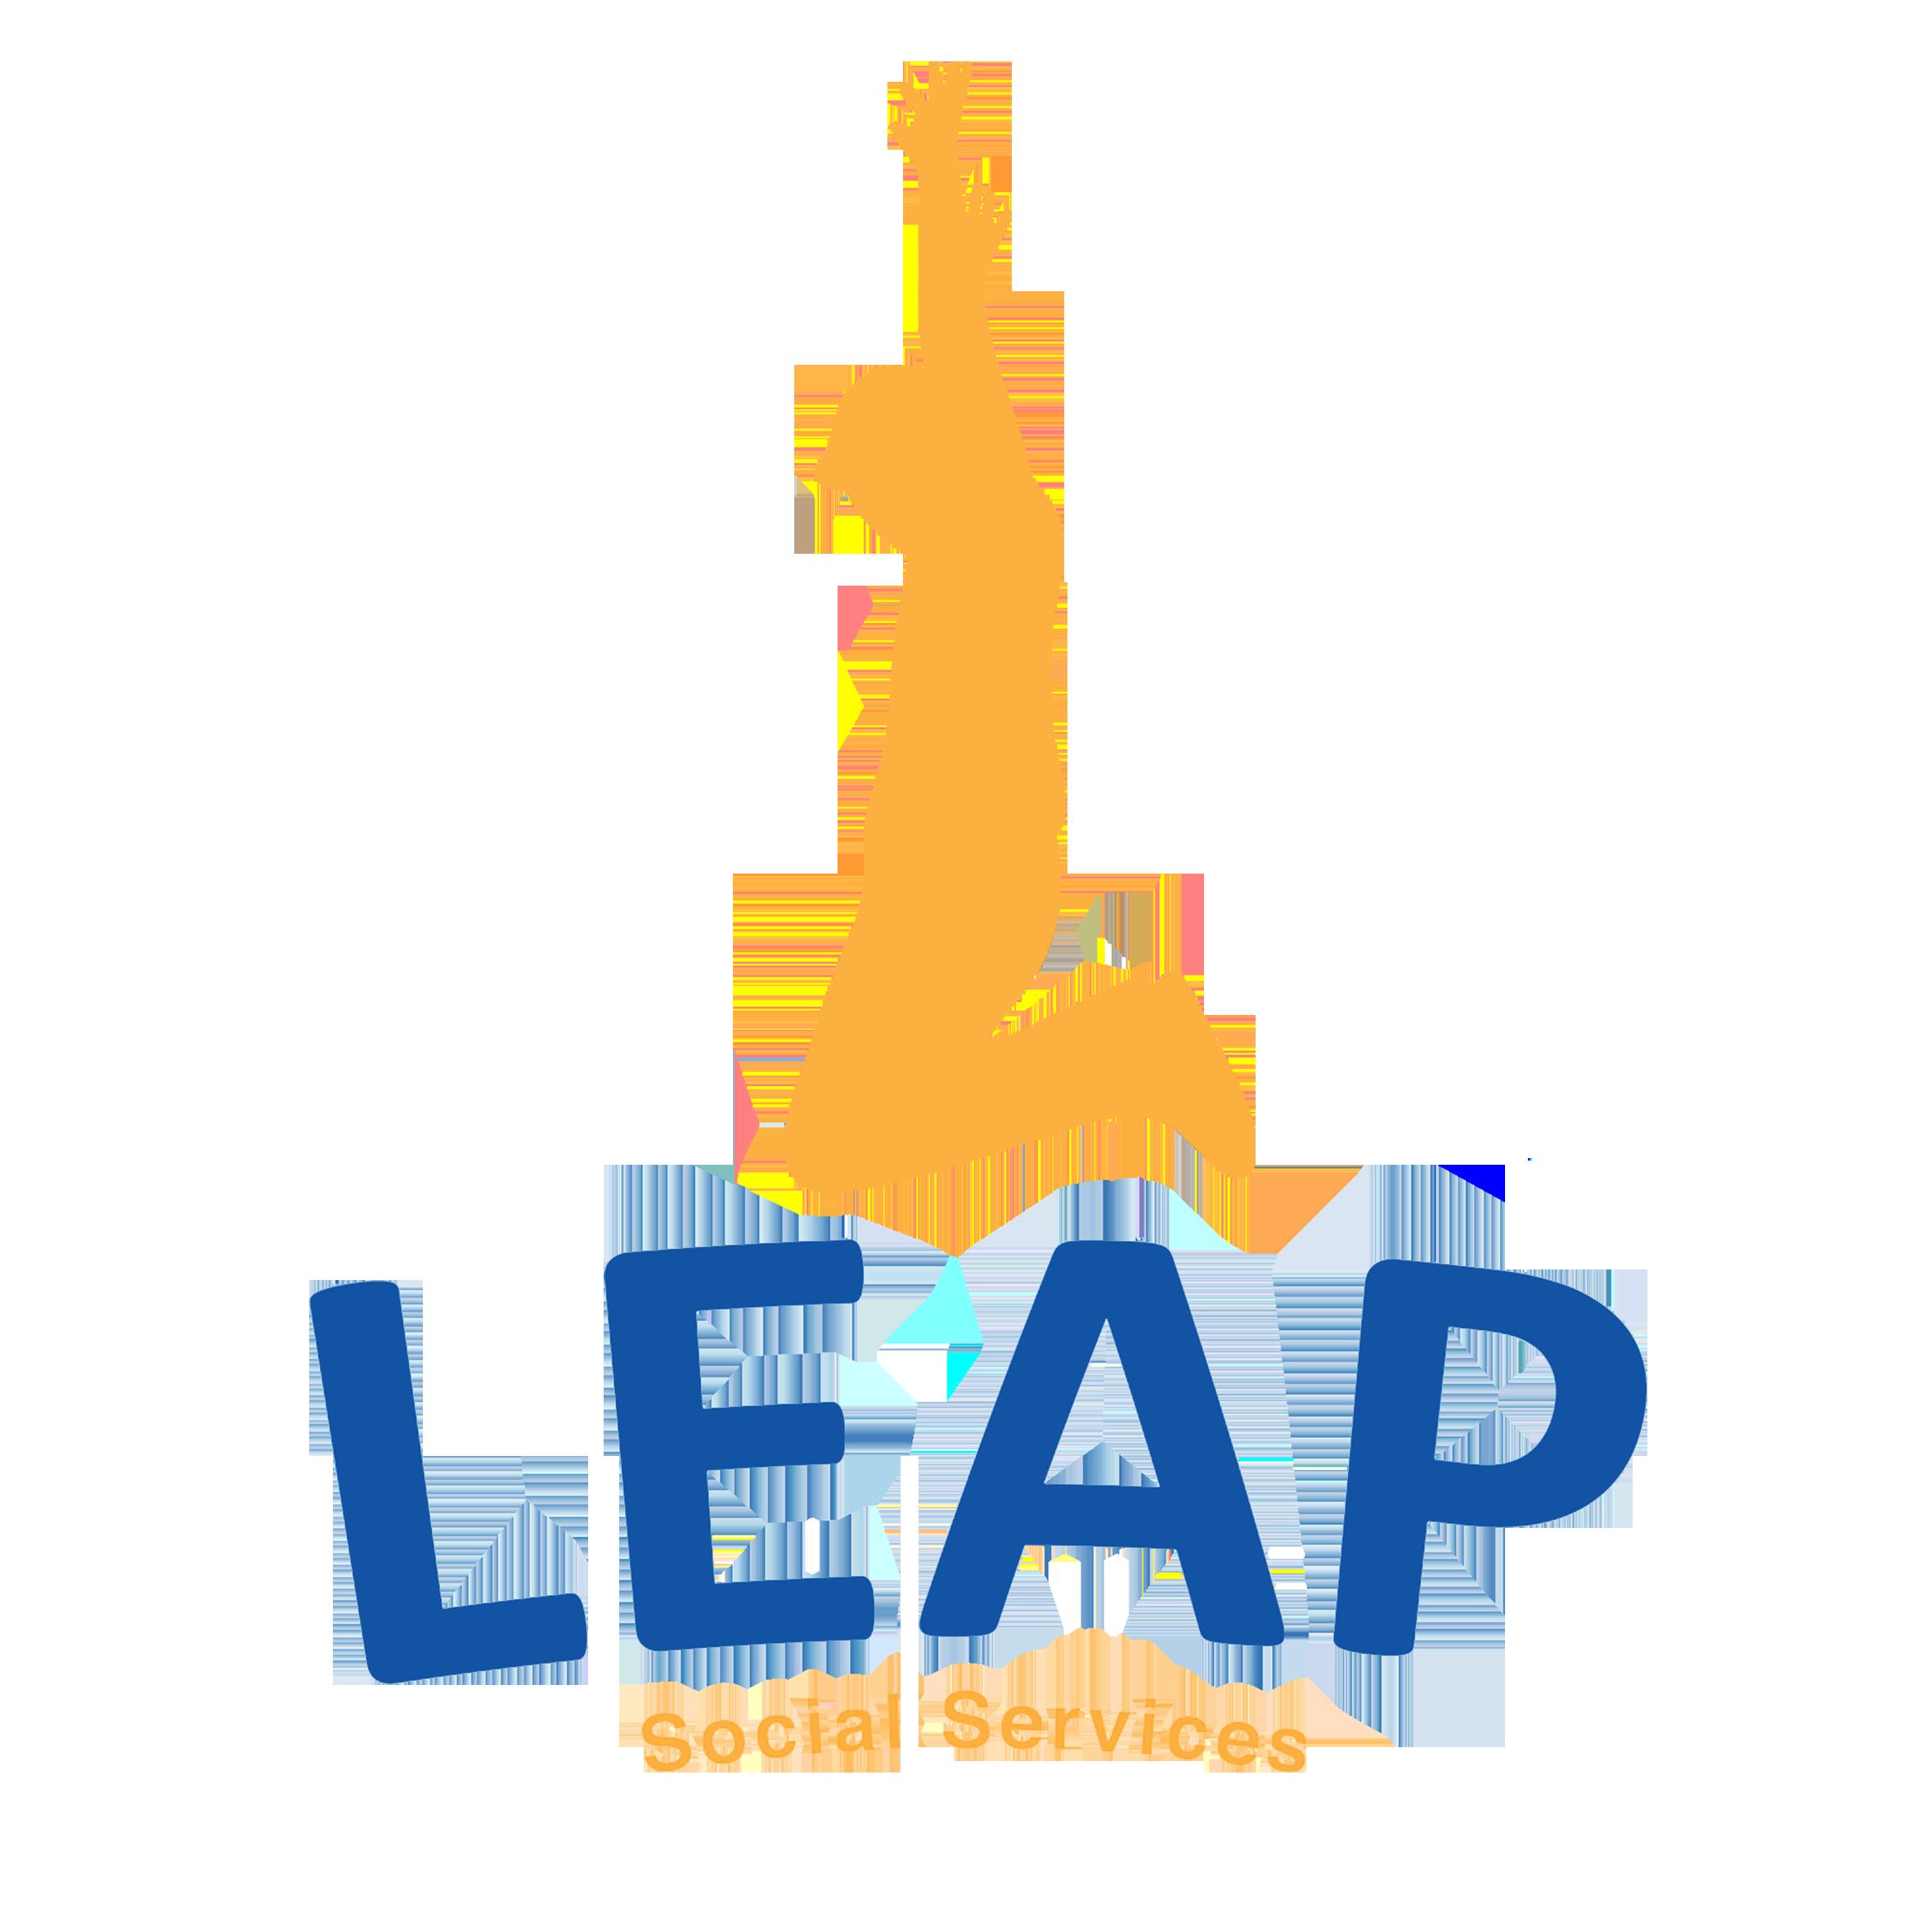 LEAP social services logo